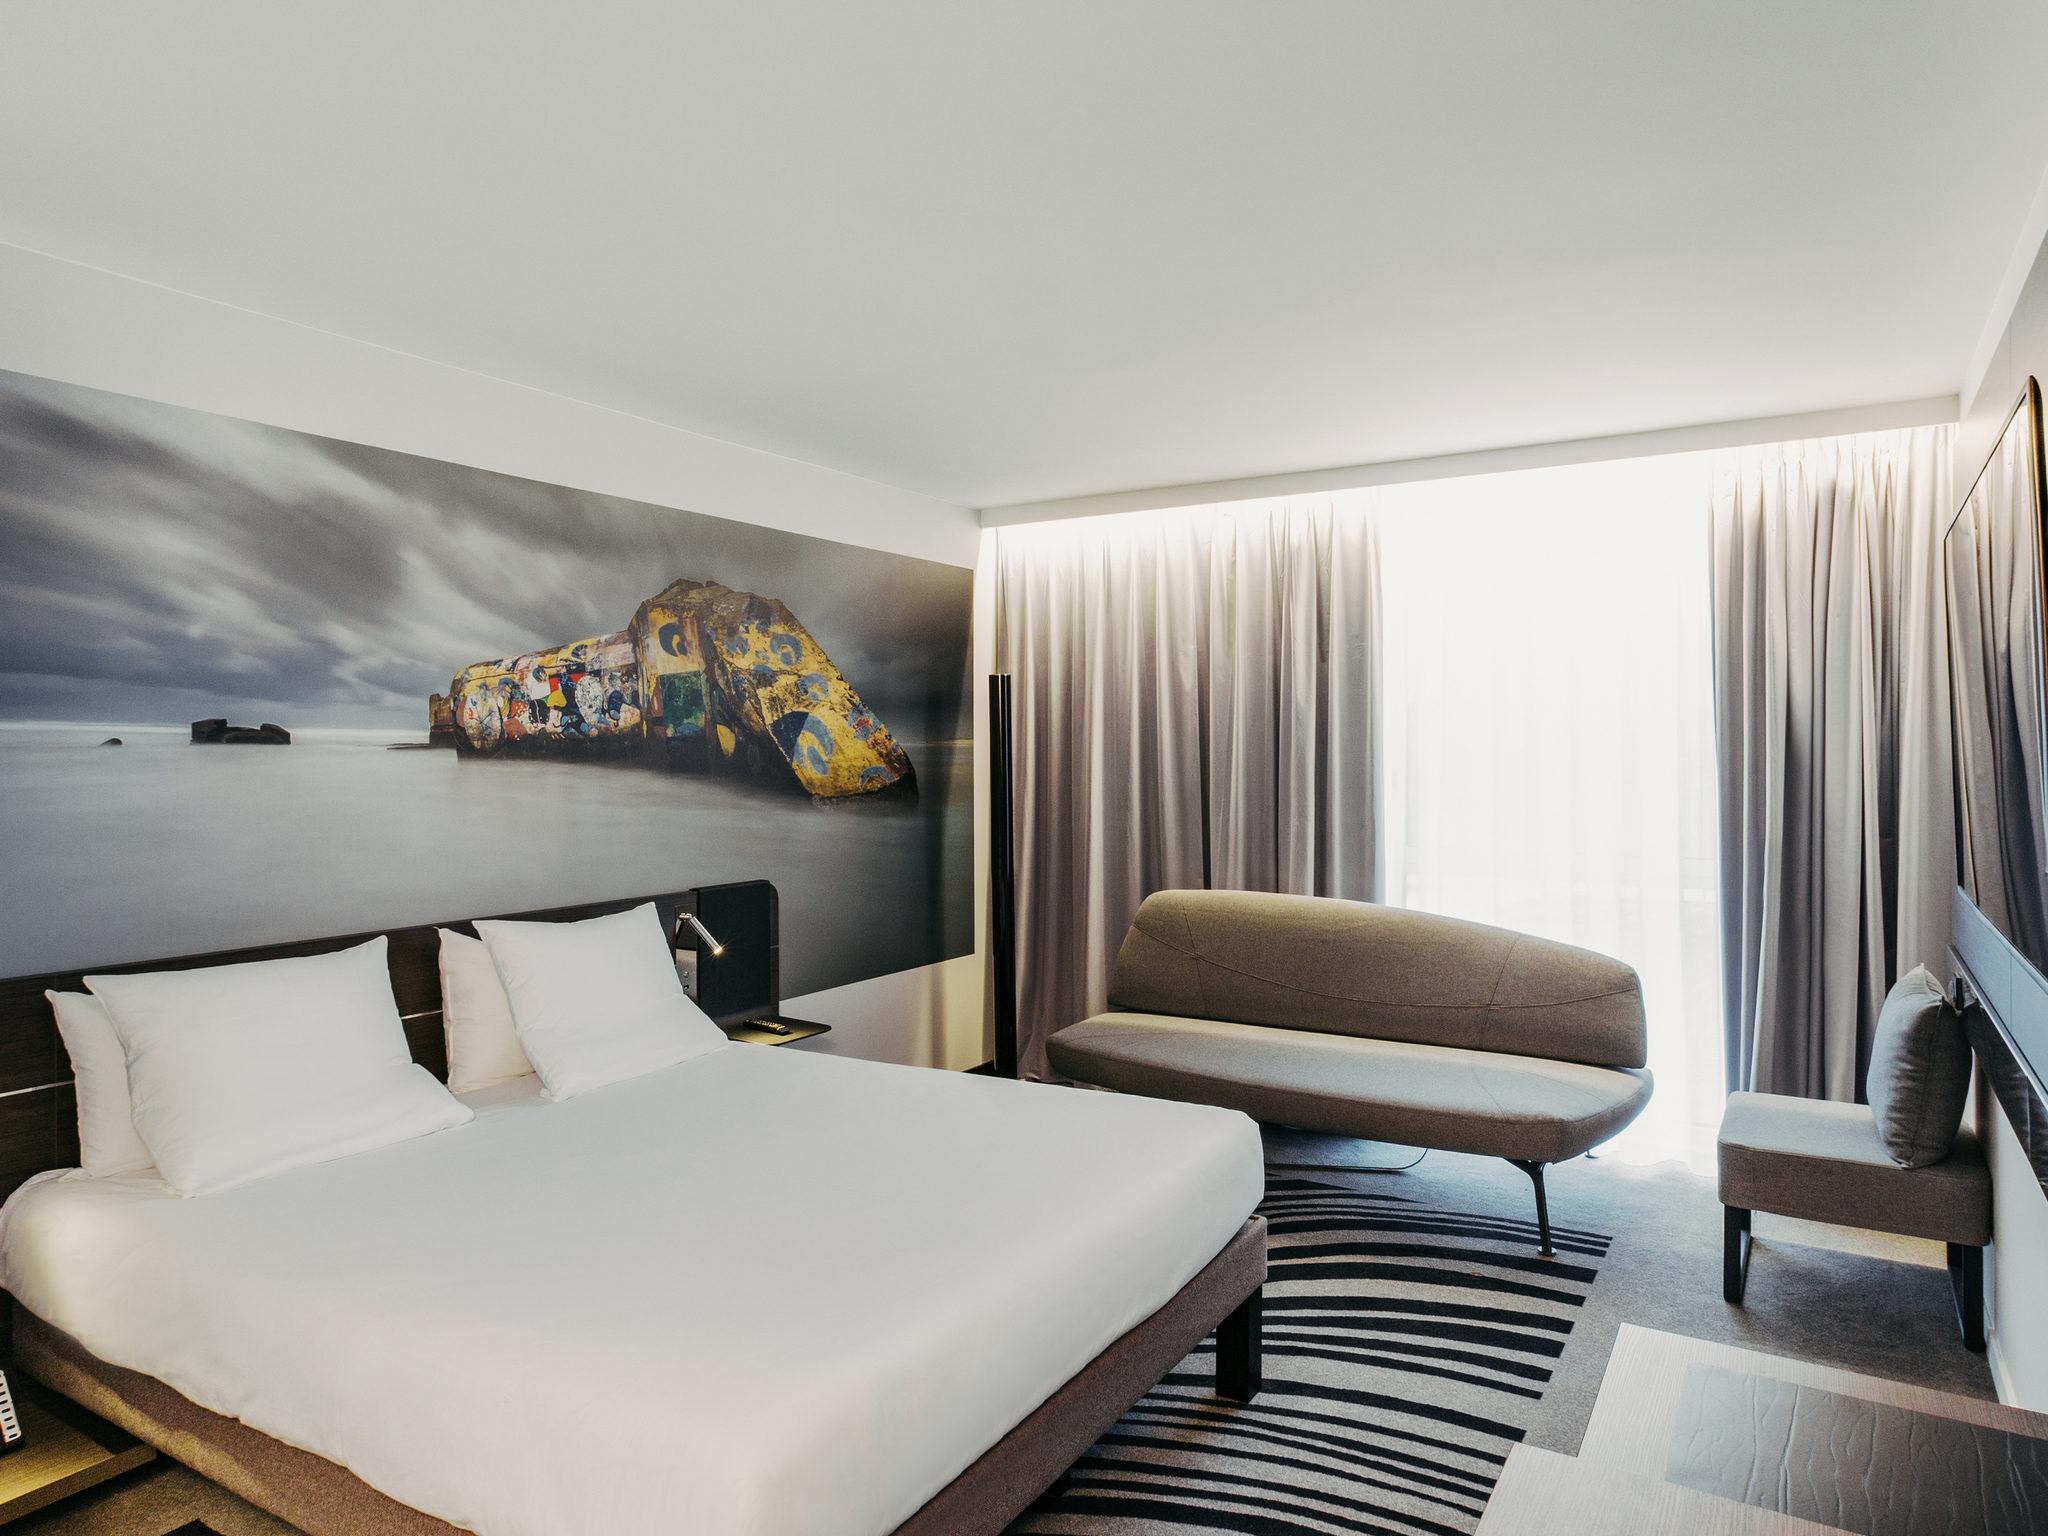 Hotel – Novotel Paris Coeur d'Orly Airport